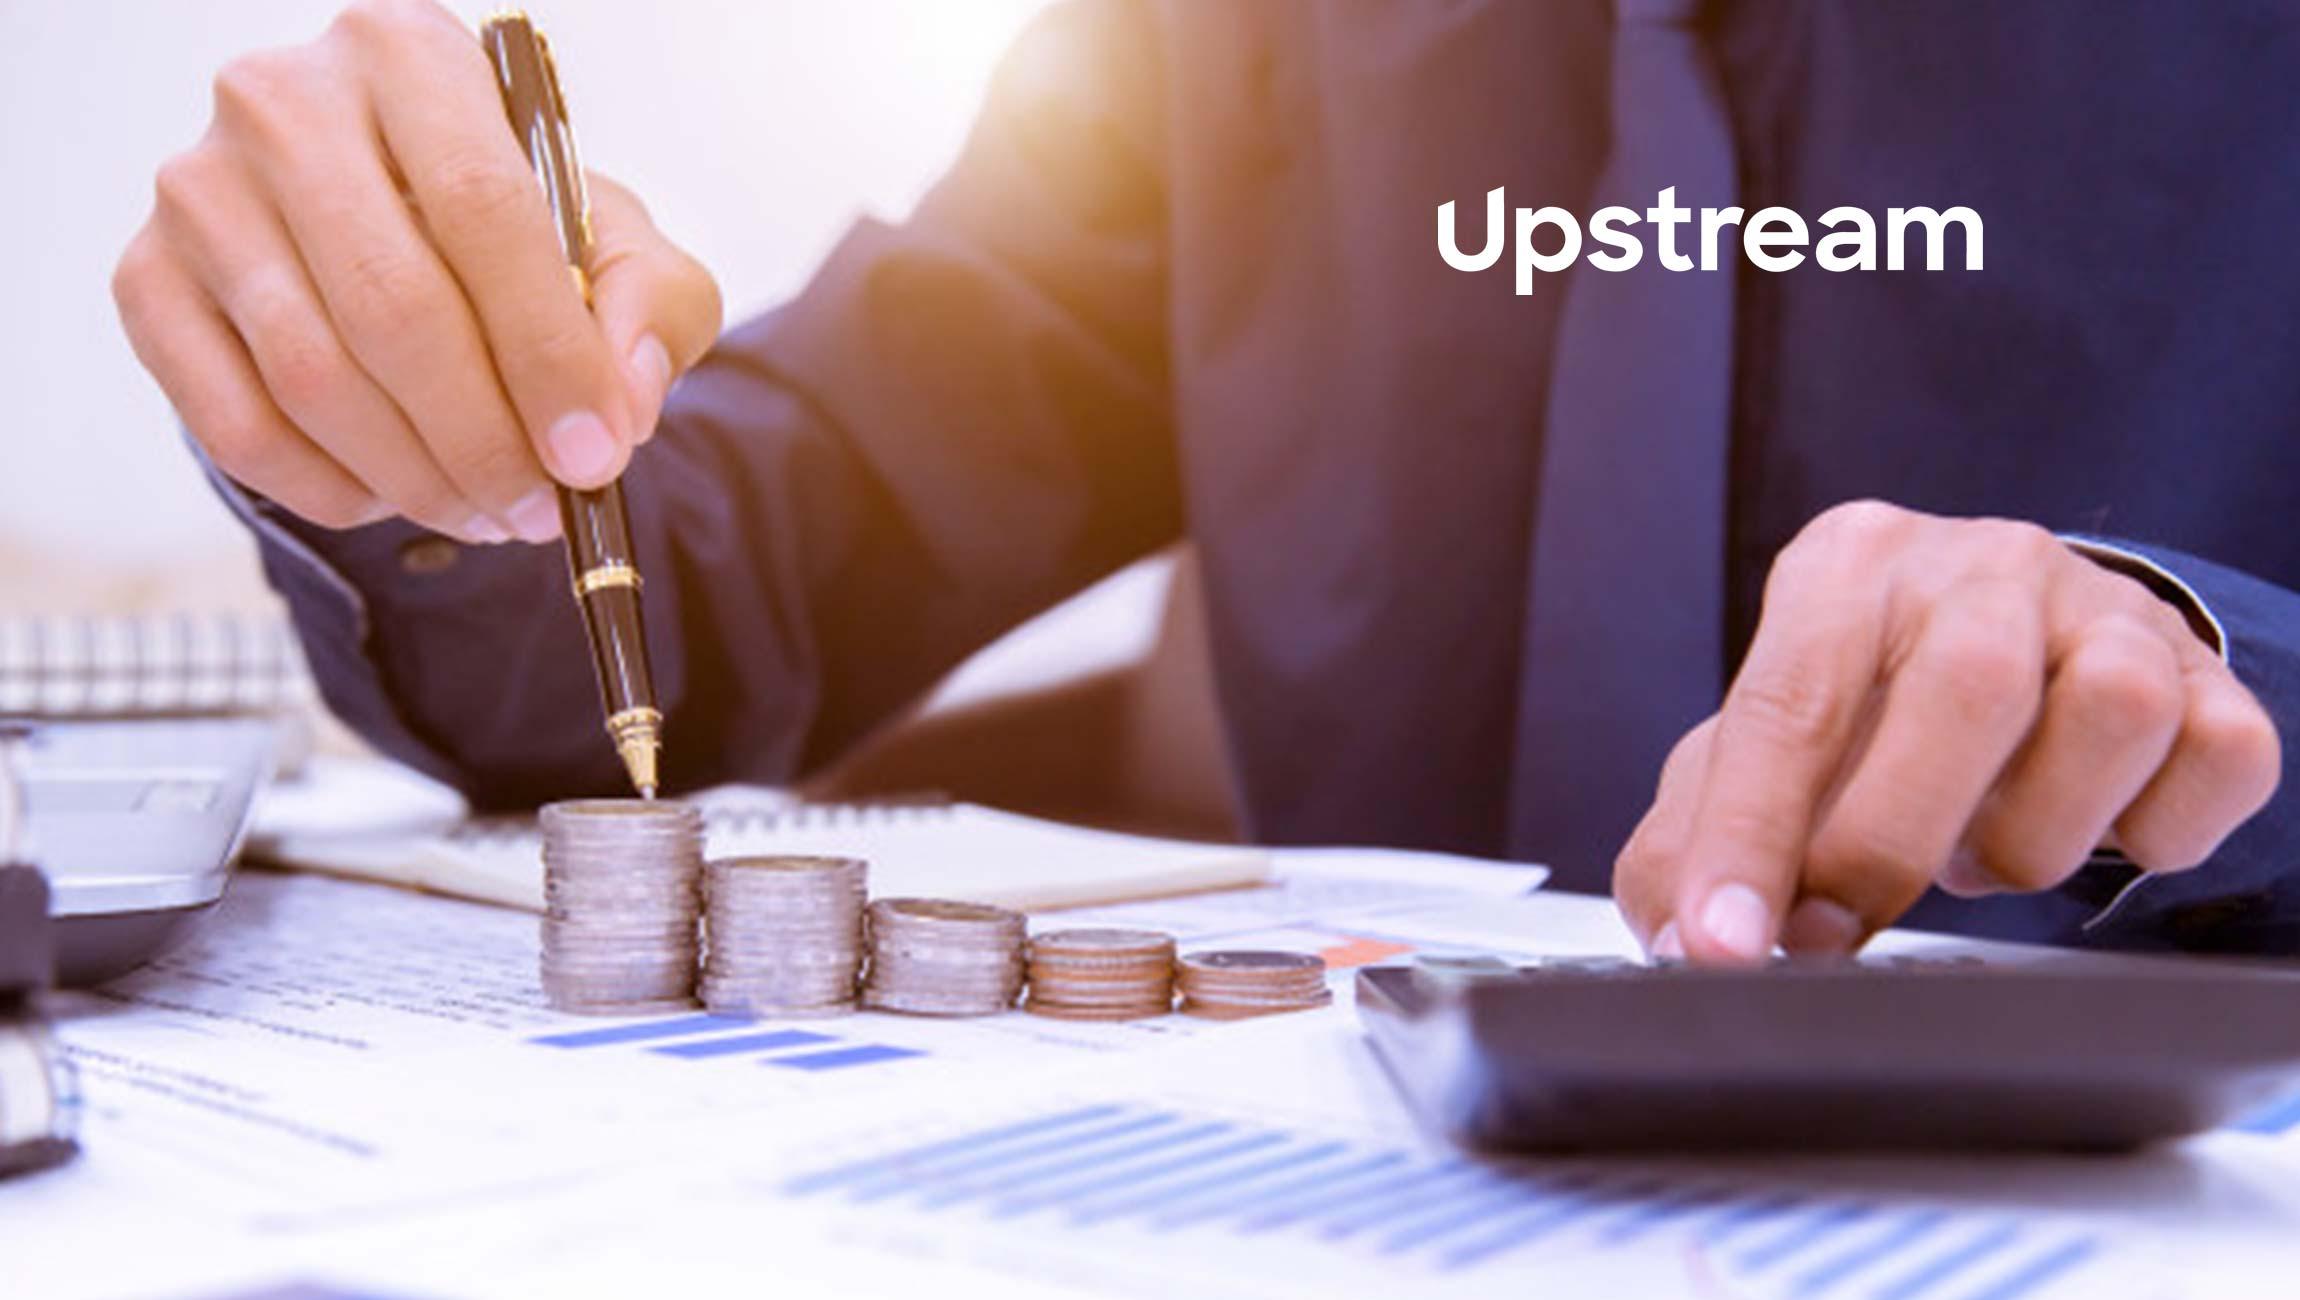 Upstream Expands Series B Funding